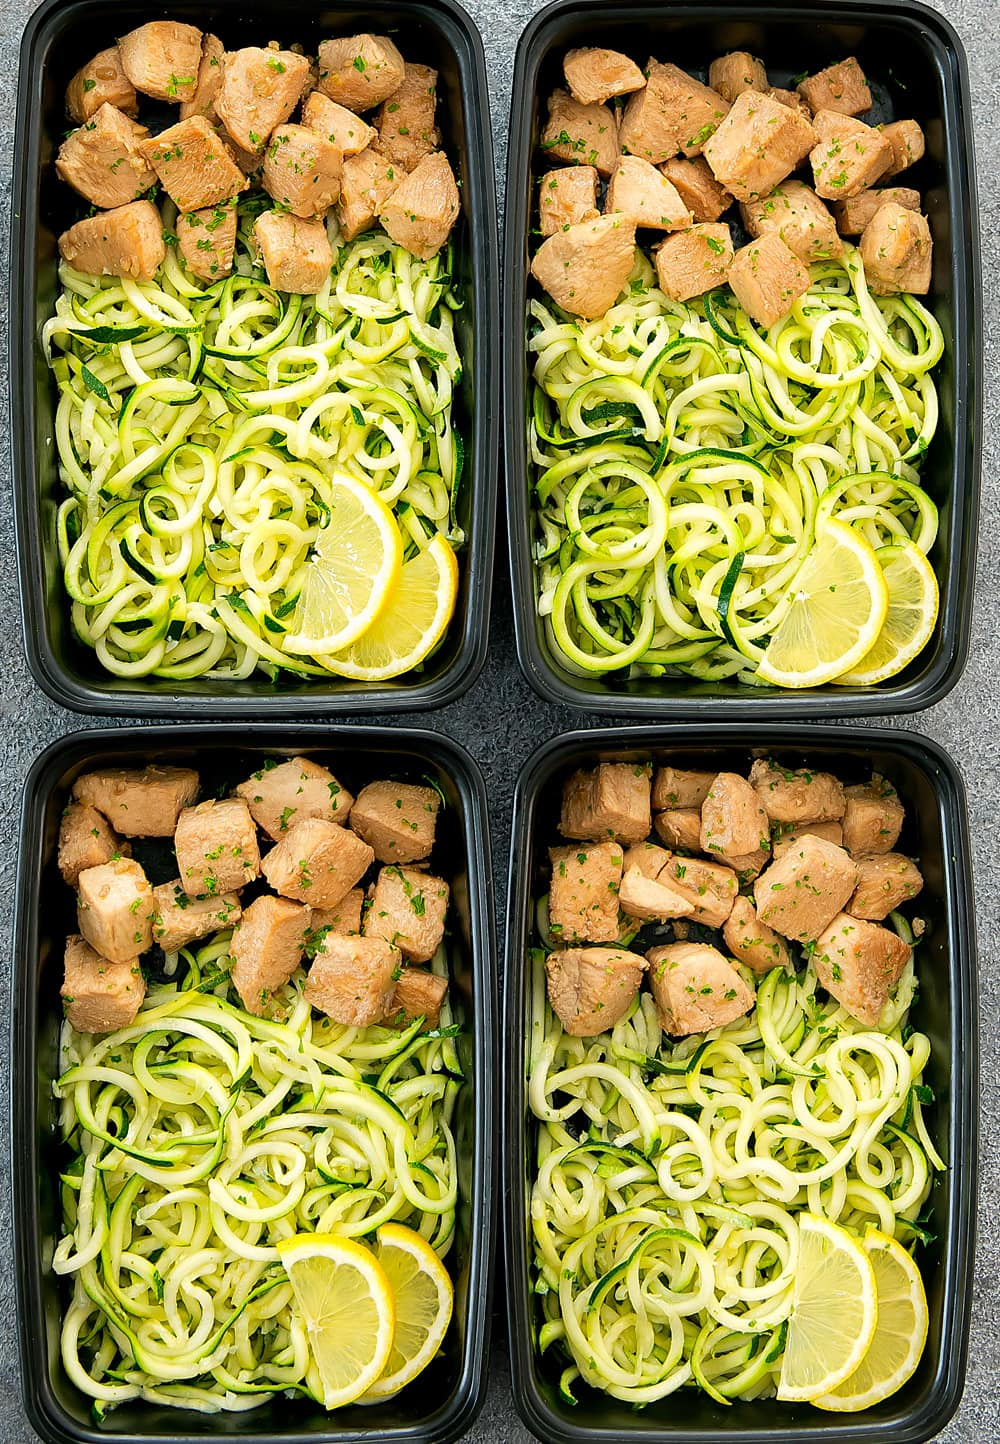 Lemon Garlic Chicken With Zucchini Noodles Meal Prep Kirbie S Cravings